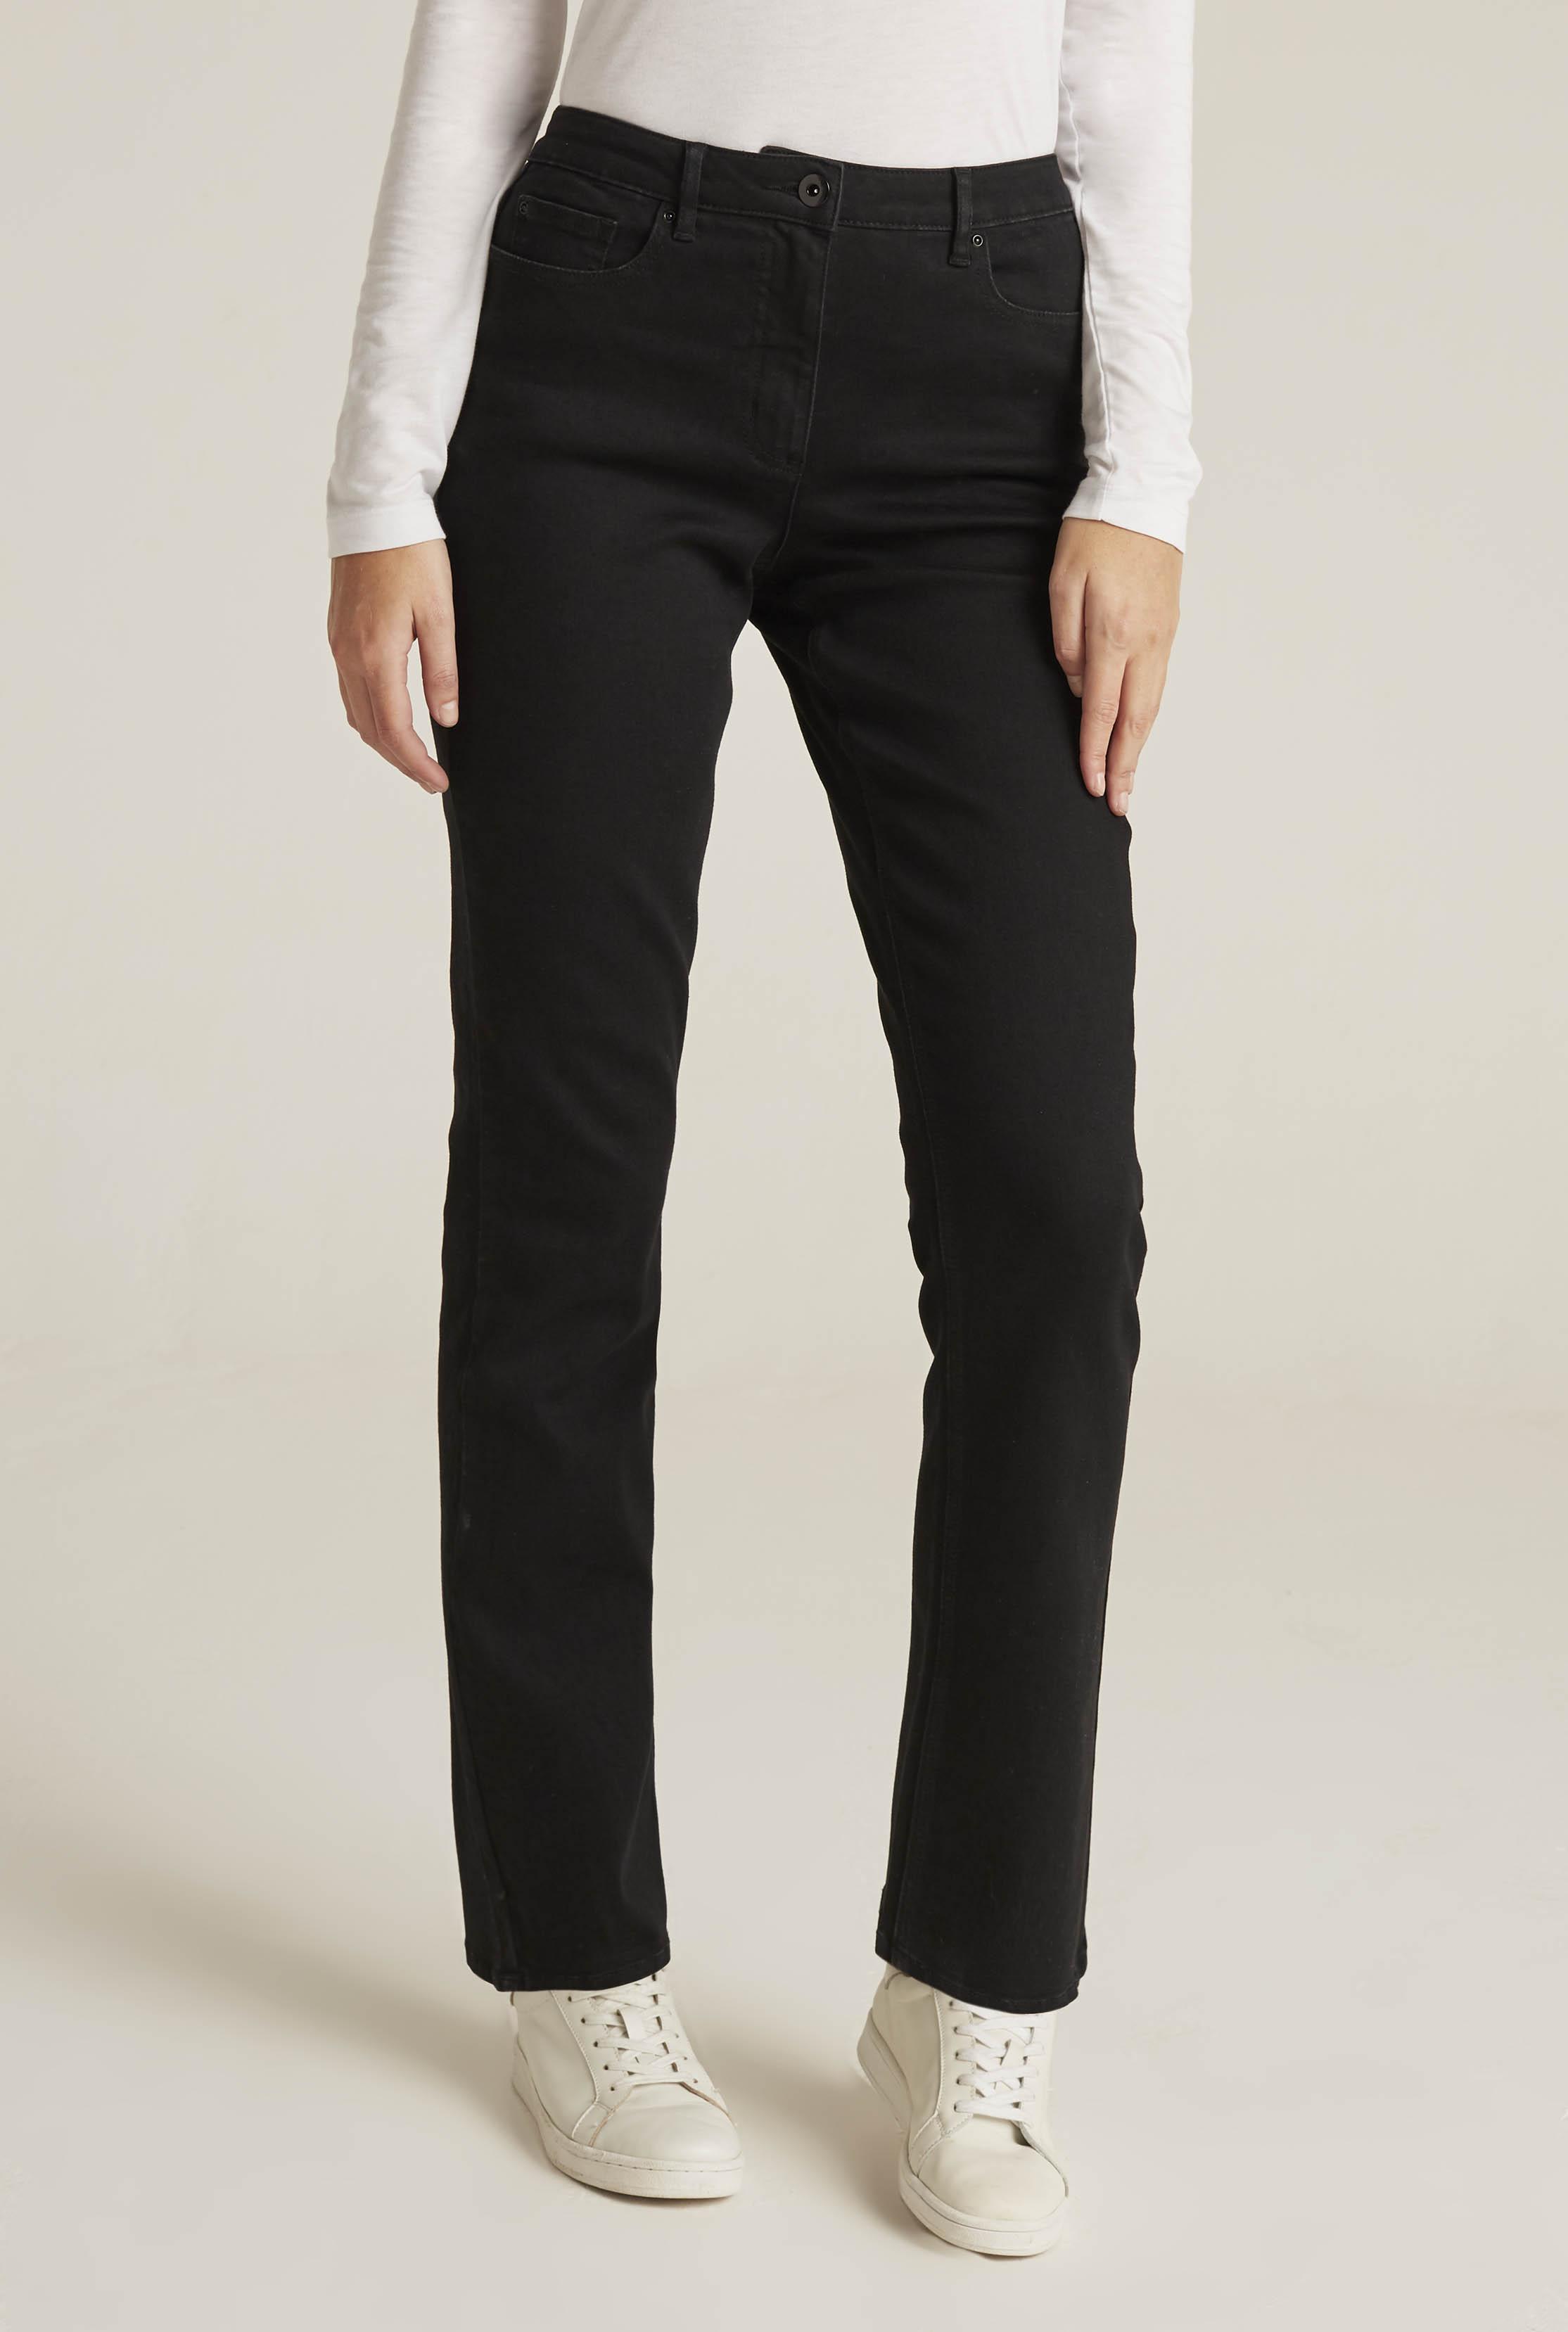 Black Mid Rise Straight Leg Jeans